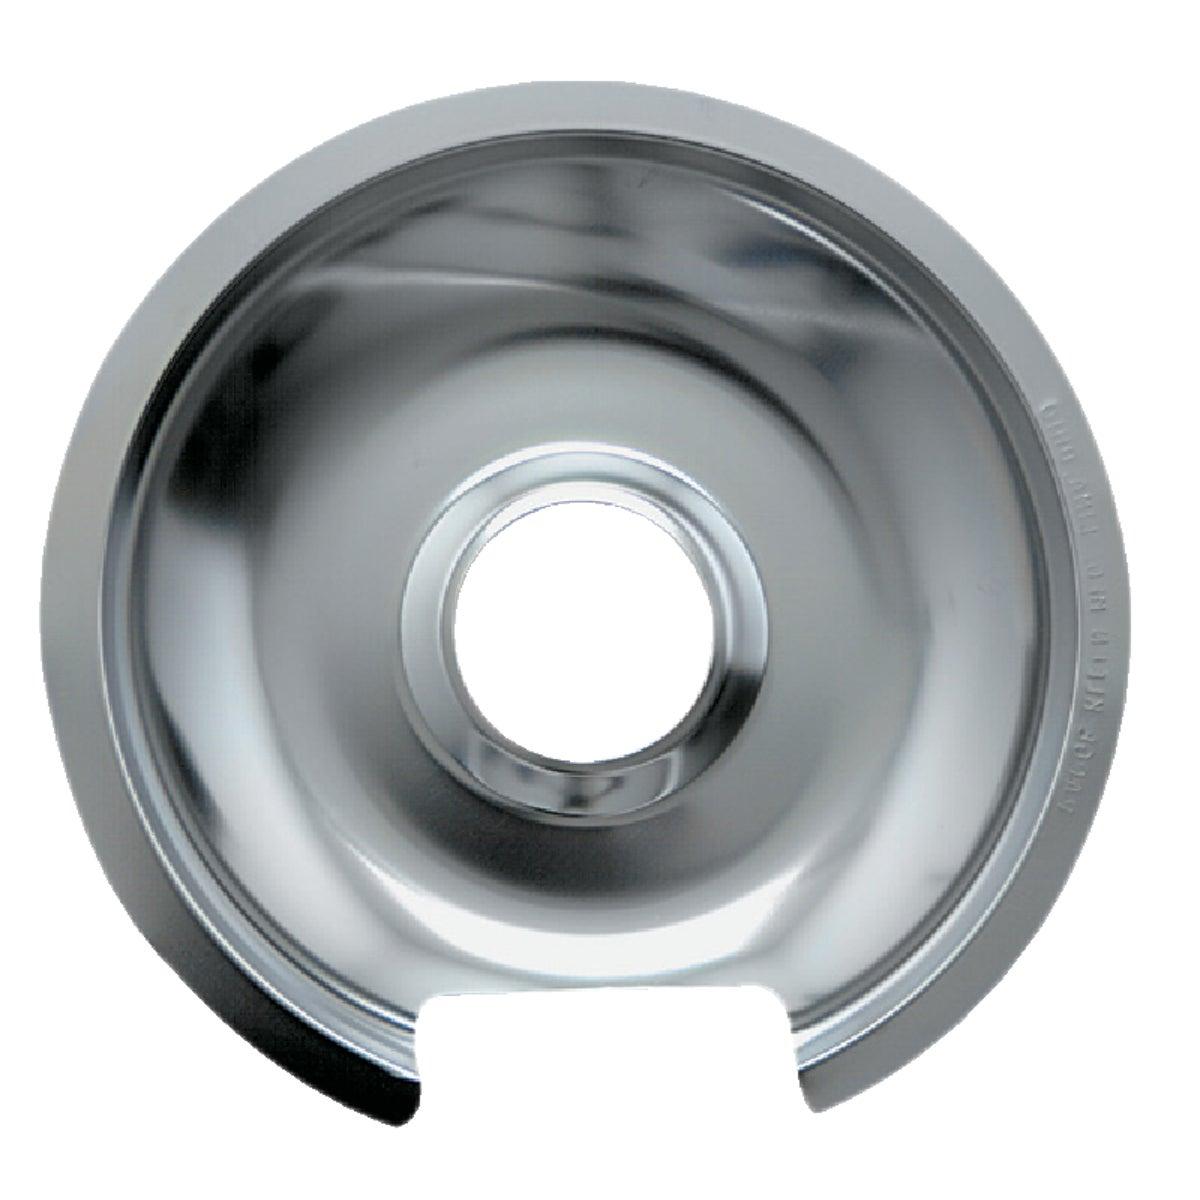 "8"" ELEC REFLCTR DRIP PAN"